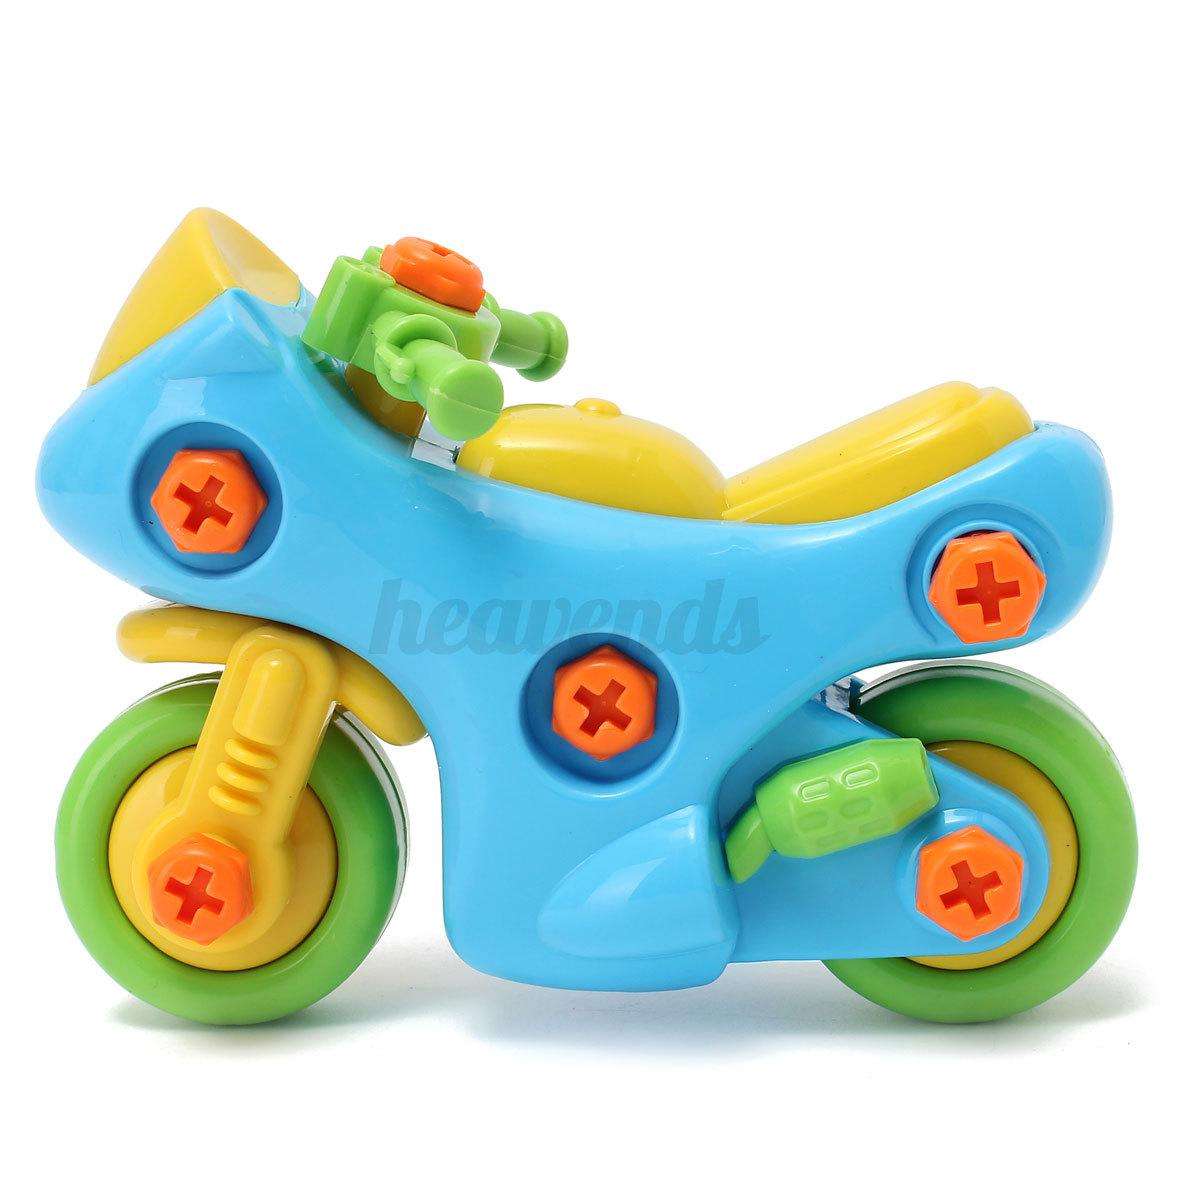 jouet jeux educatif avion train el phant tortue moto suv pr enfant b b cadeau. Black Bedroom Furniture Sets. Home Design Ideas